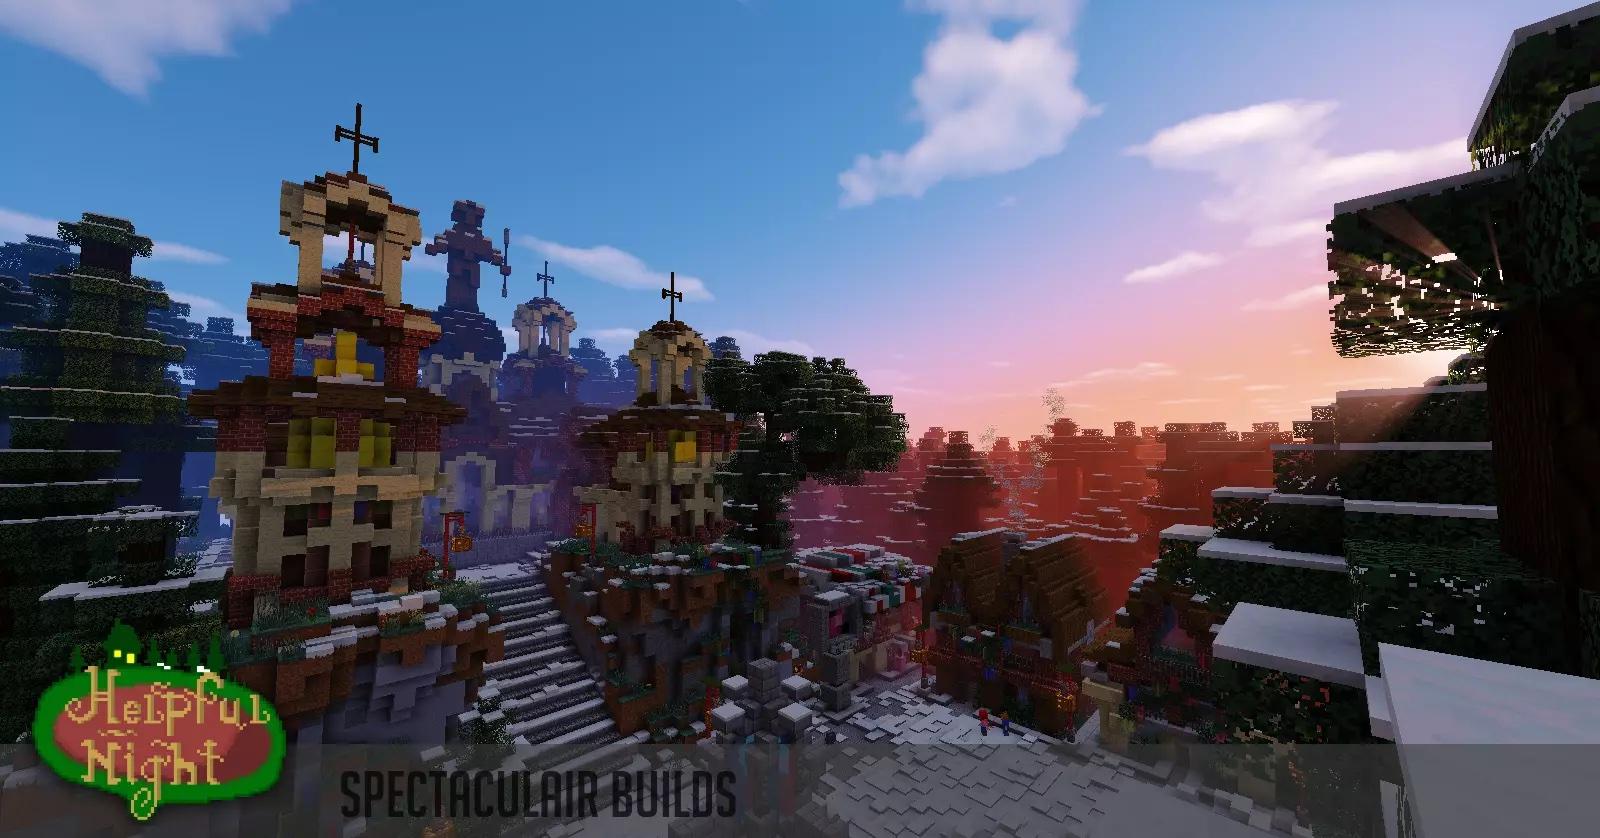 A-Helpful-Night-Map-Minecraft-2